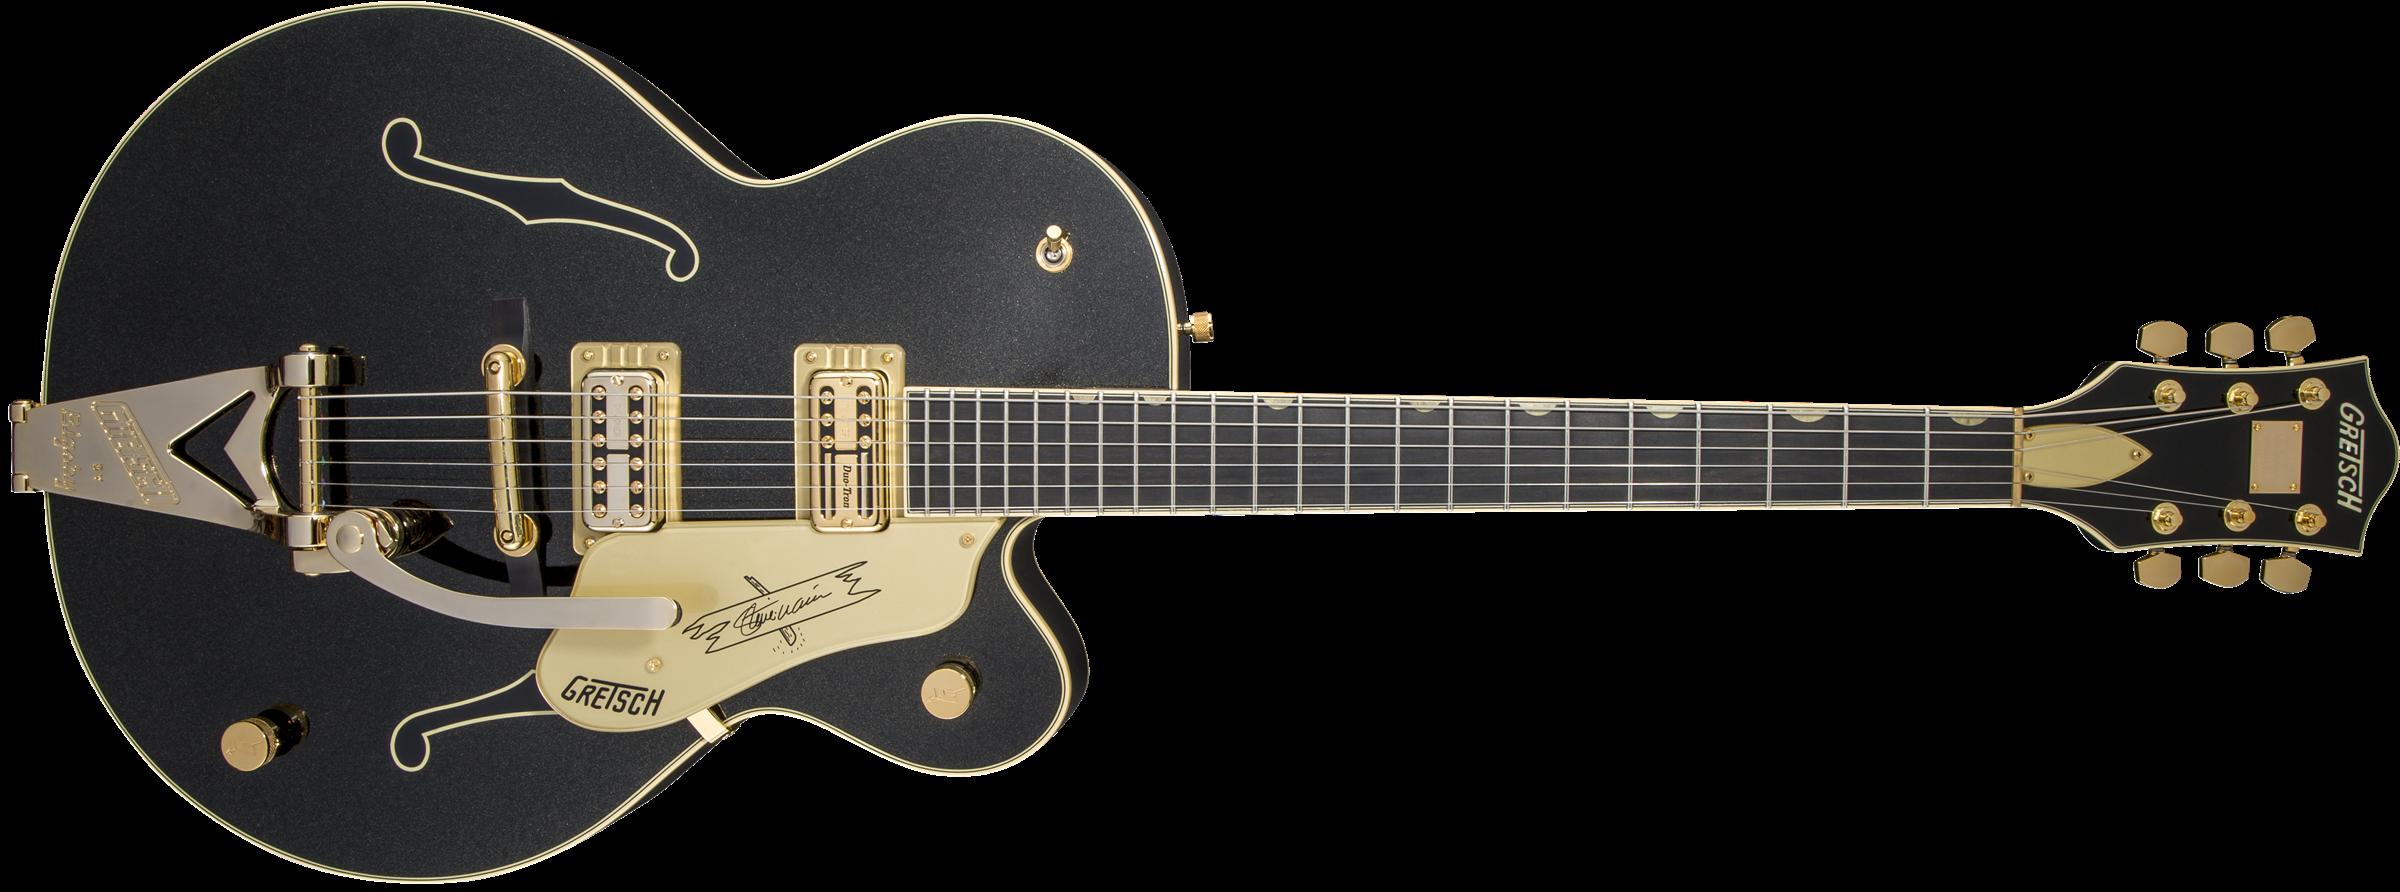 GRETSCH-G6120T-SW-Steve-Wariner-Signature-Nashville-Gentleman-with-Bigsby-Ebony-Fingerboard-Magic-Black-sku-571002968